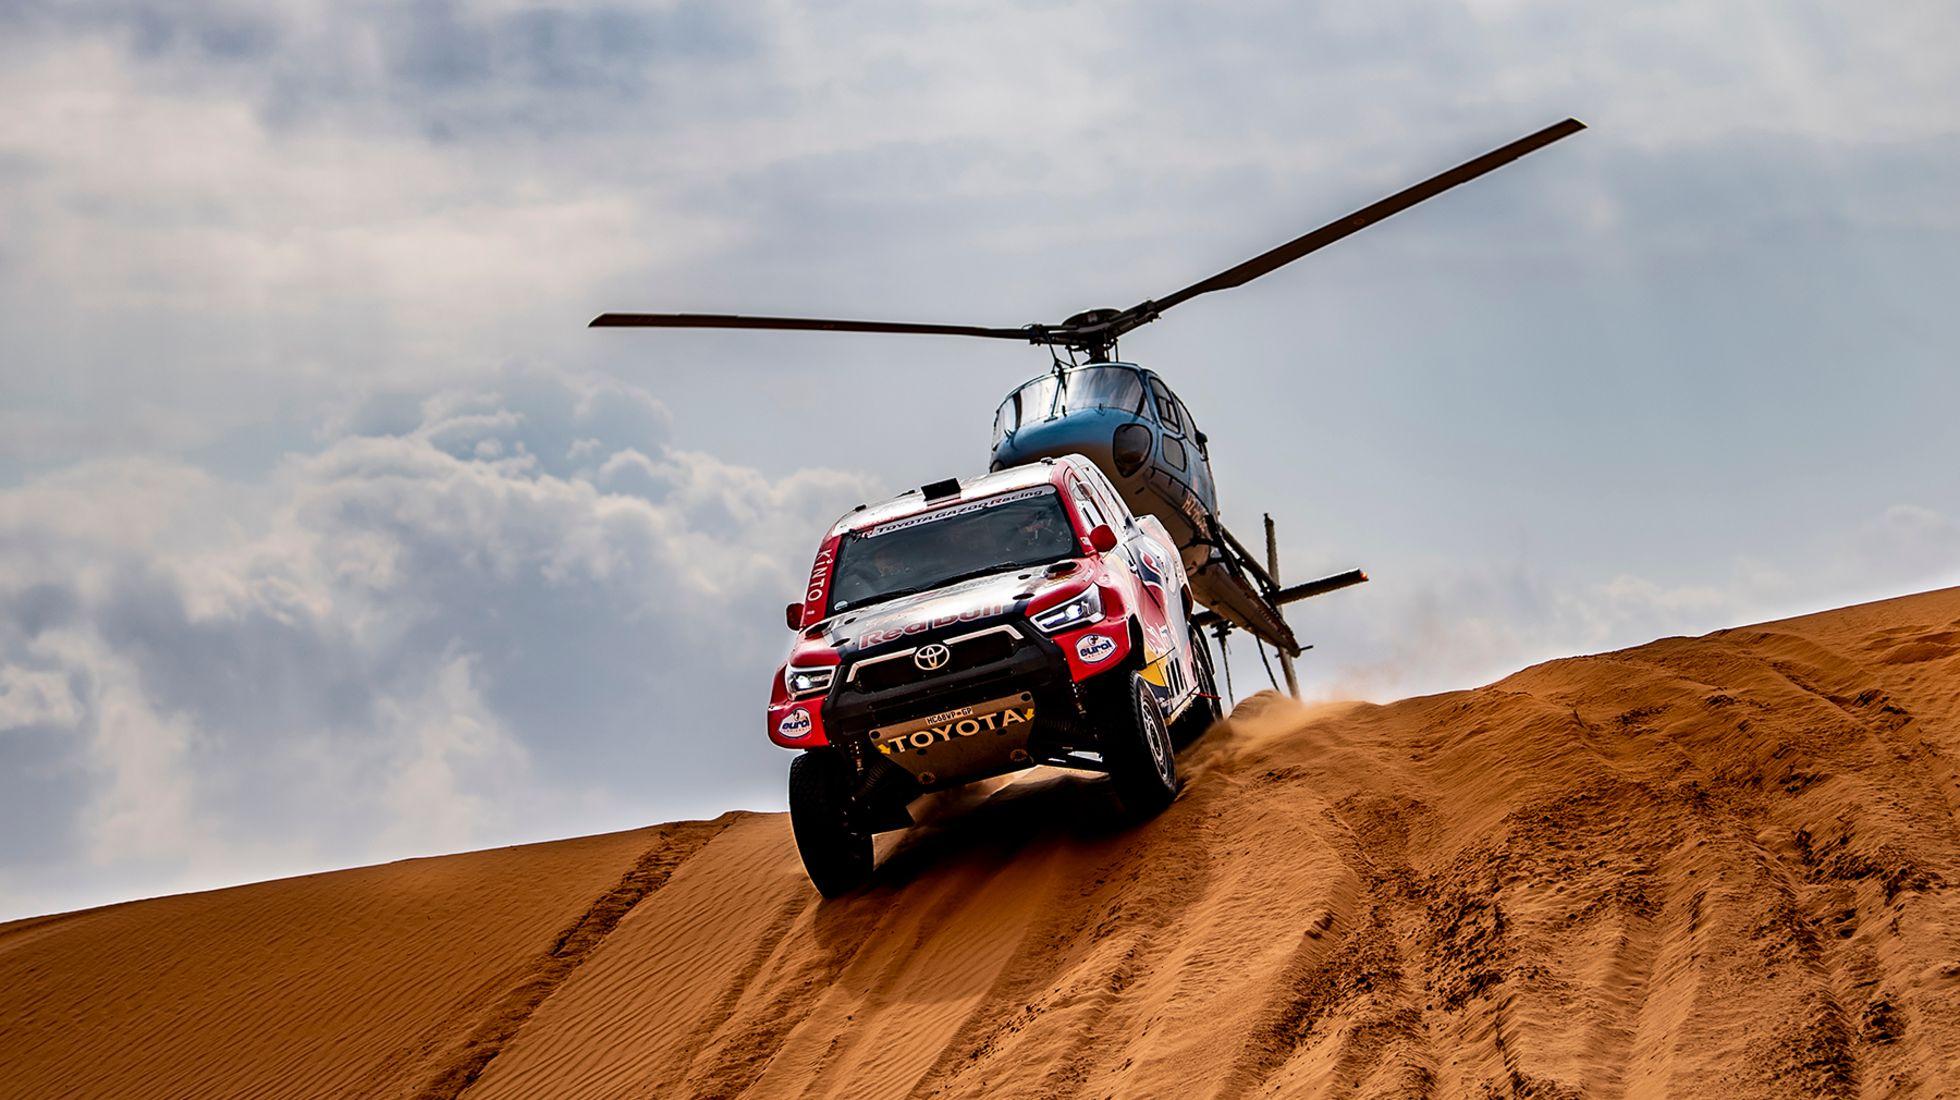 Dakar Review after Stage 8: Toyota's Al-Attiyah reels Peterhansel in